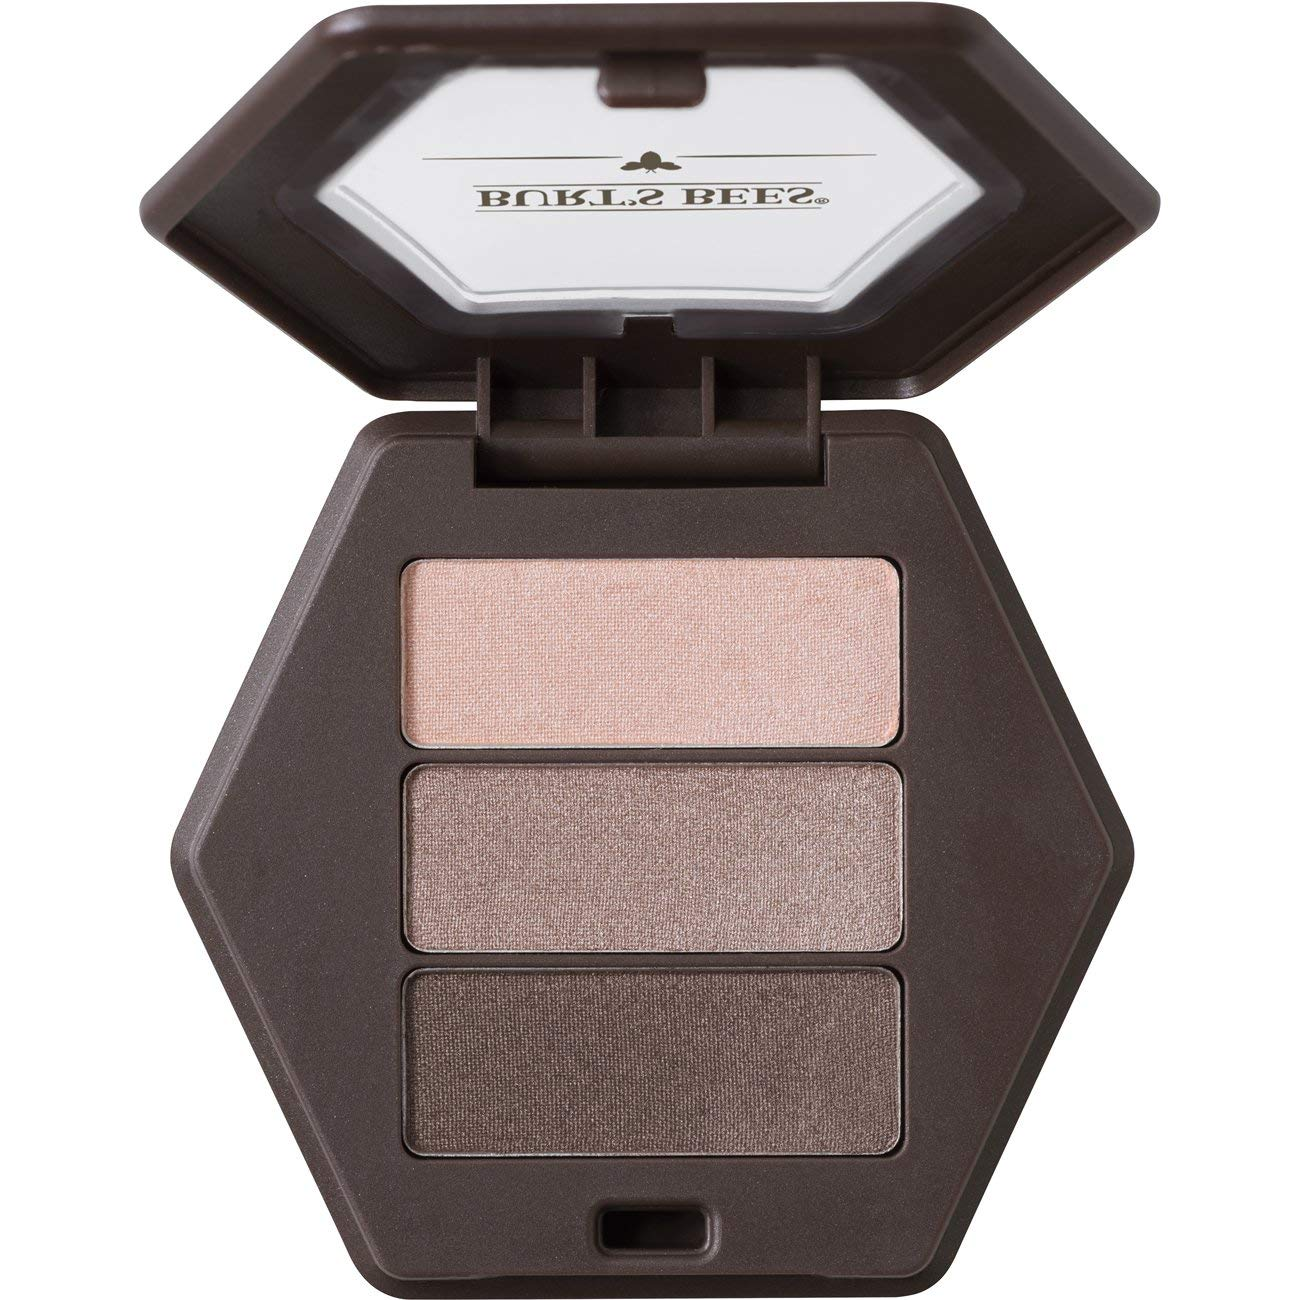 Burt's Bees 100% Natural Origin Eye Shadow Palette Trio Shimmering Nudes - 0.12 Ounce